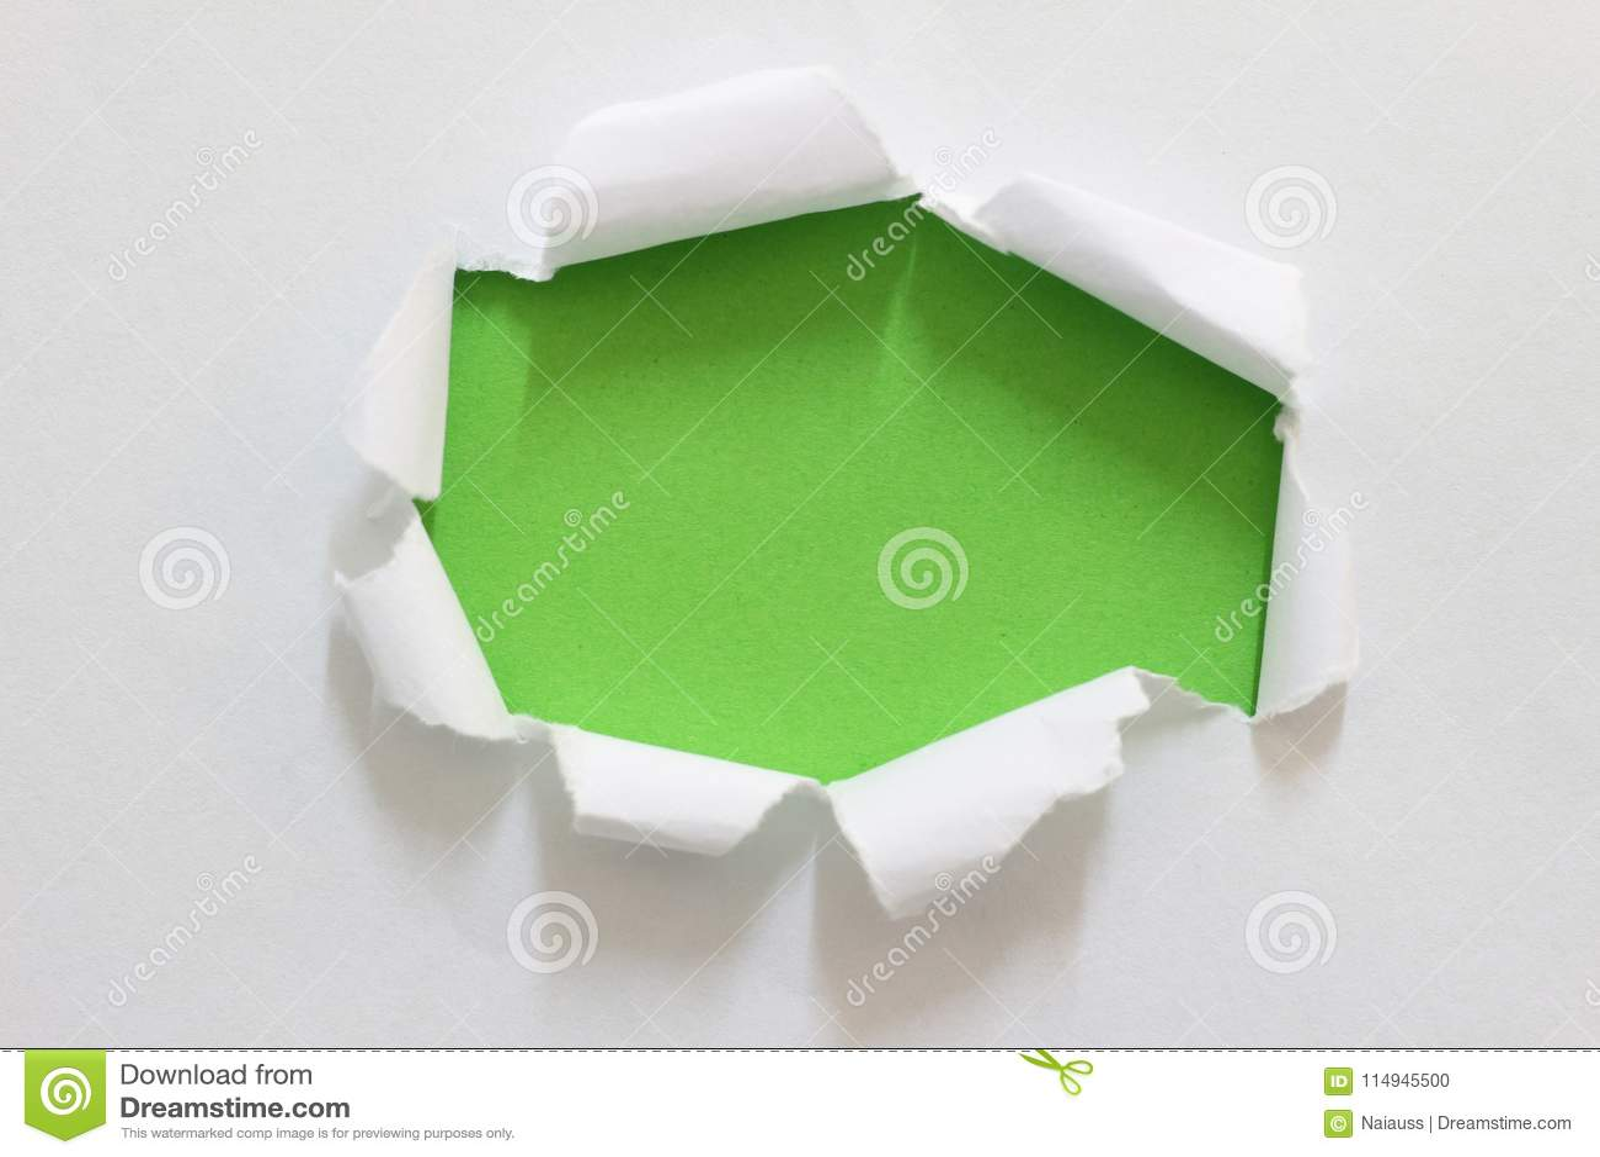 Torn rip paper